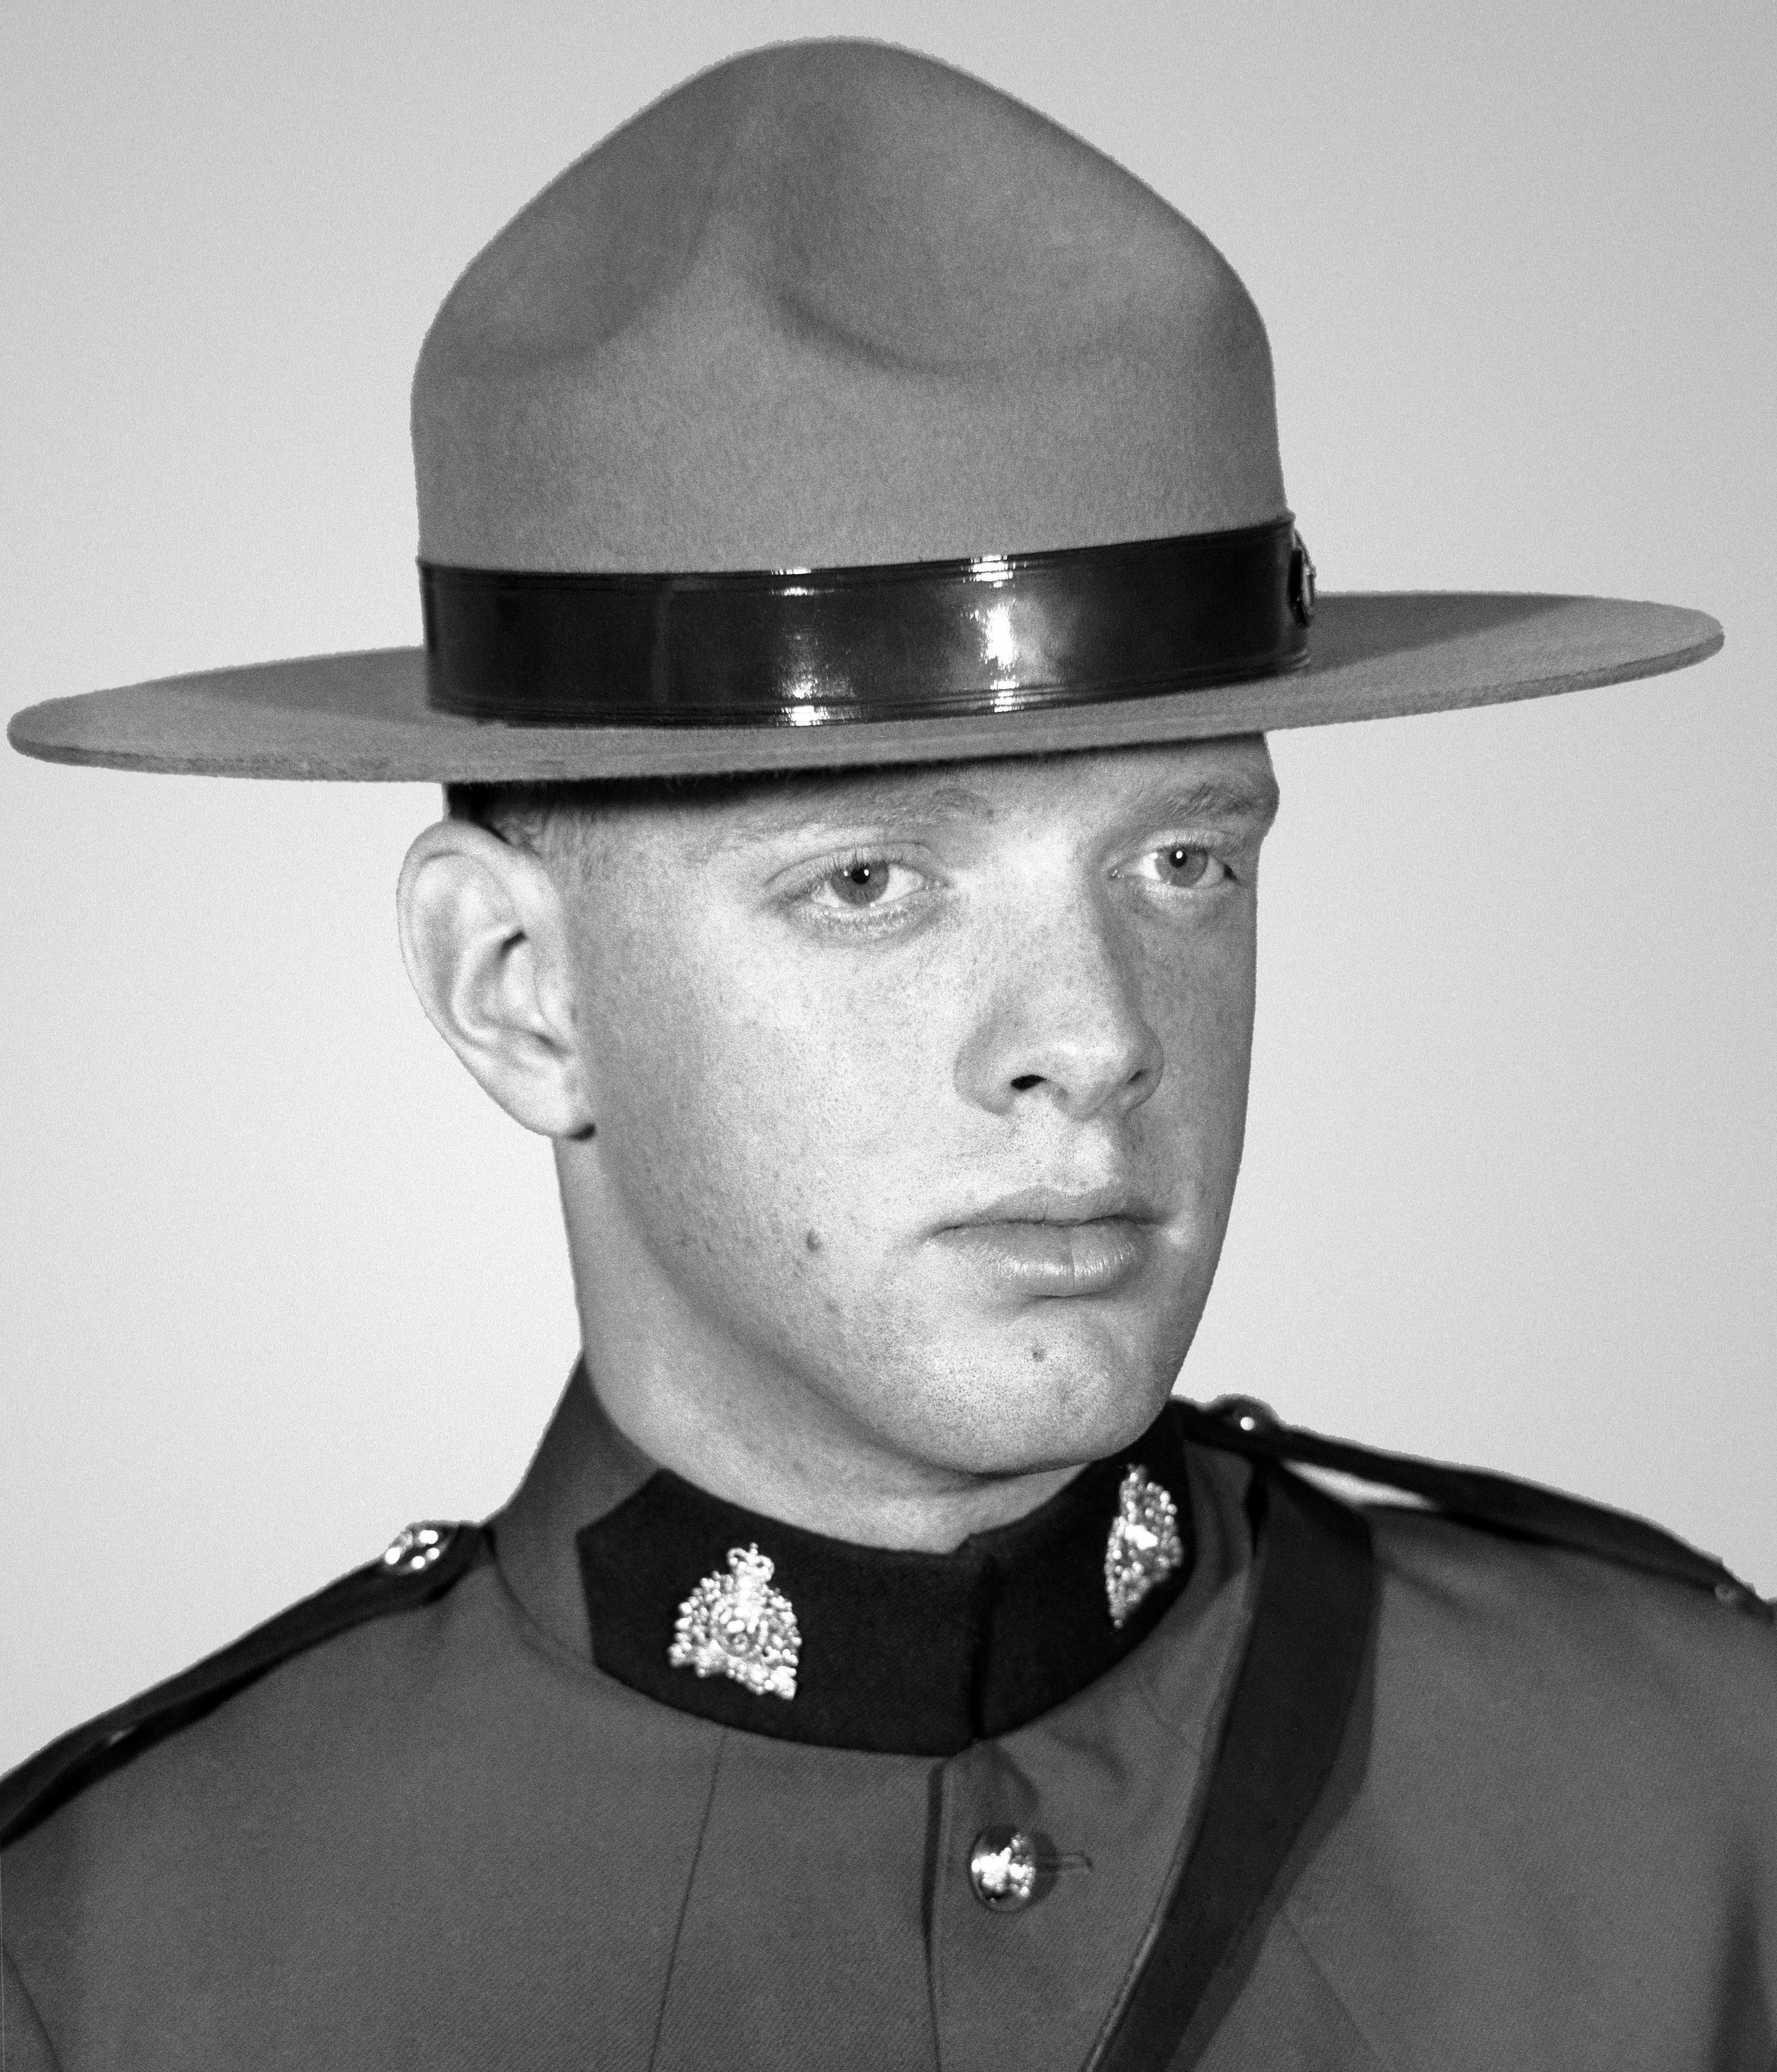 Special Constable George David Foster